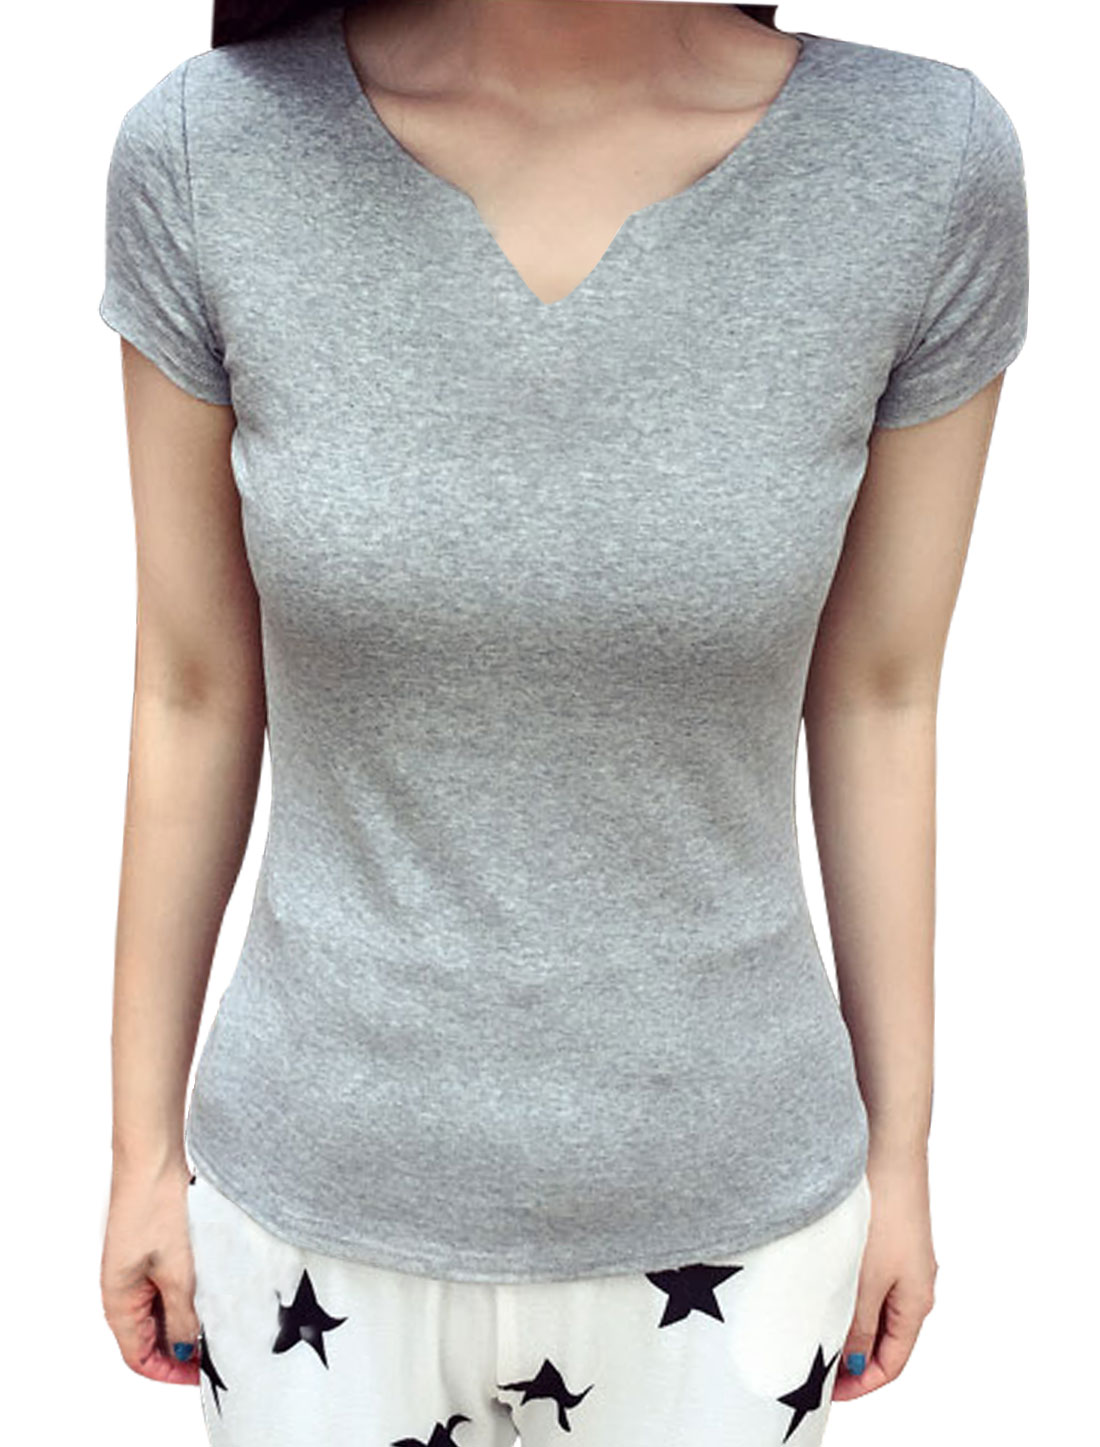 Women Split Neck Short Sleeve Slim Fit Summer T Shirt Light Gray XS